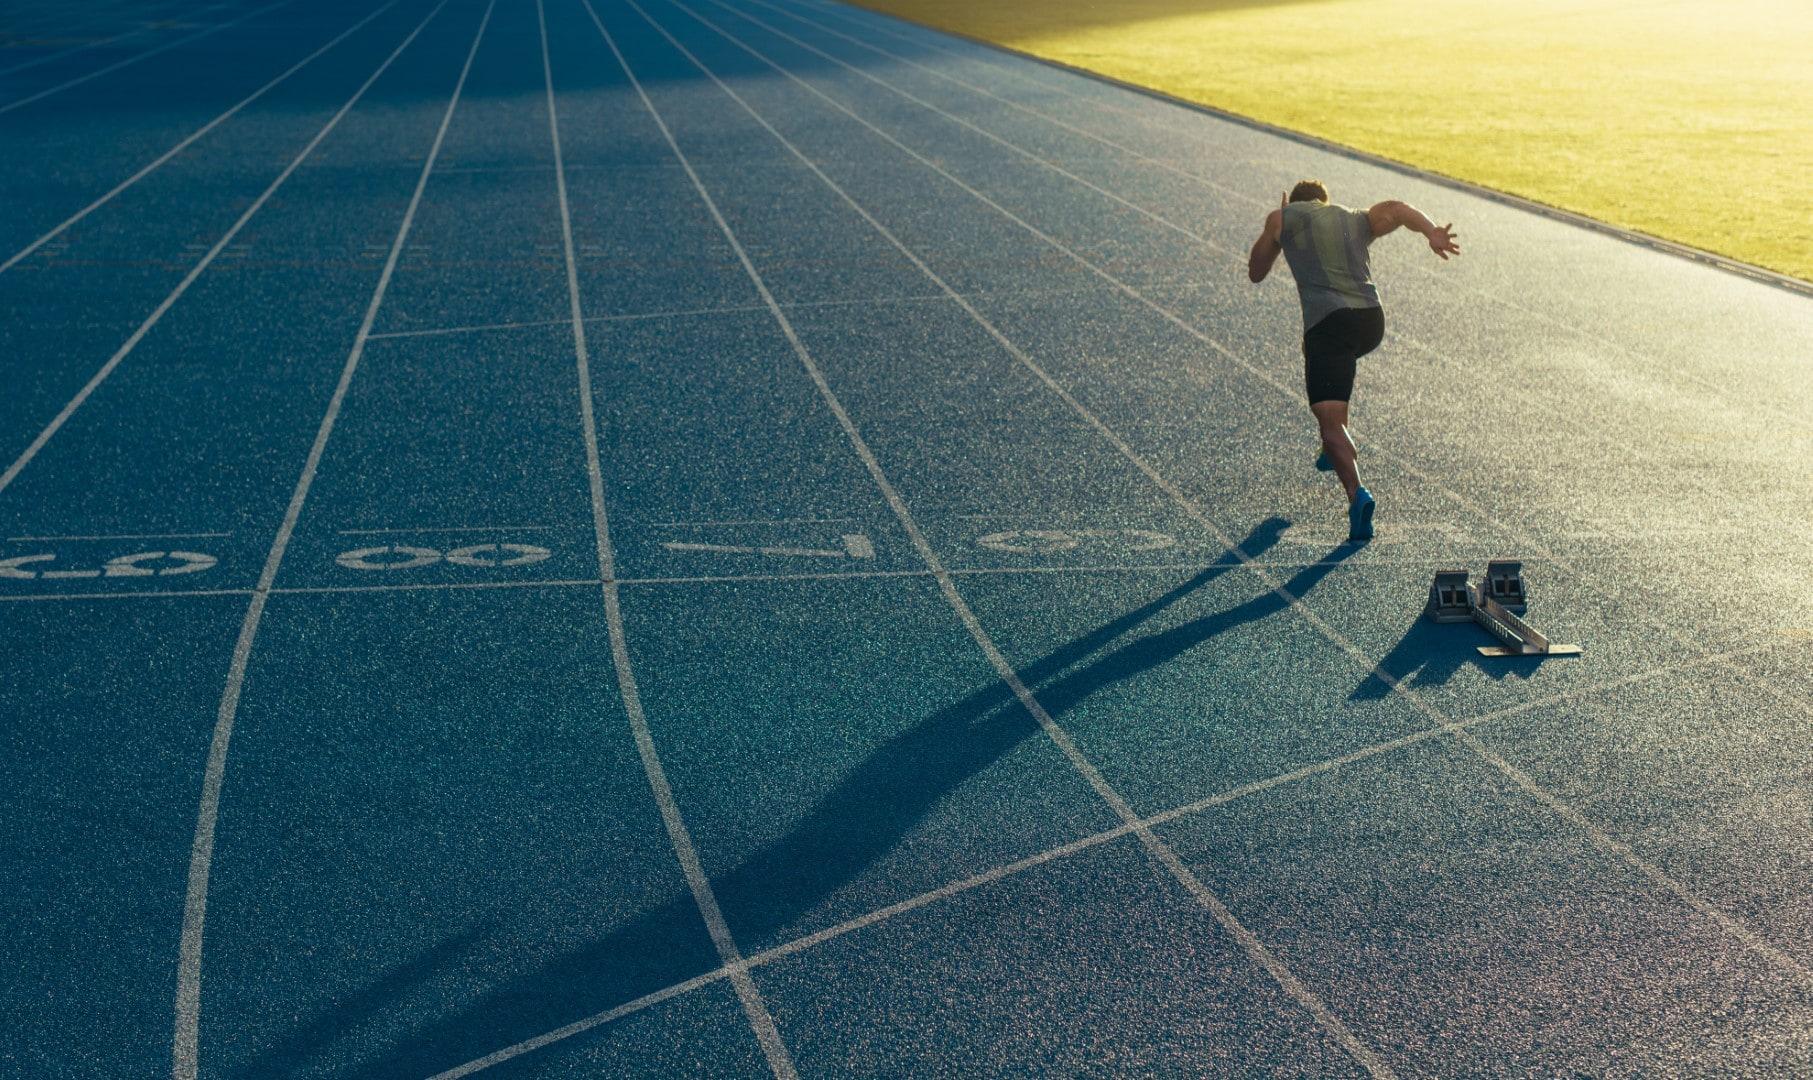 runner-Large.jpeg